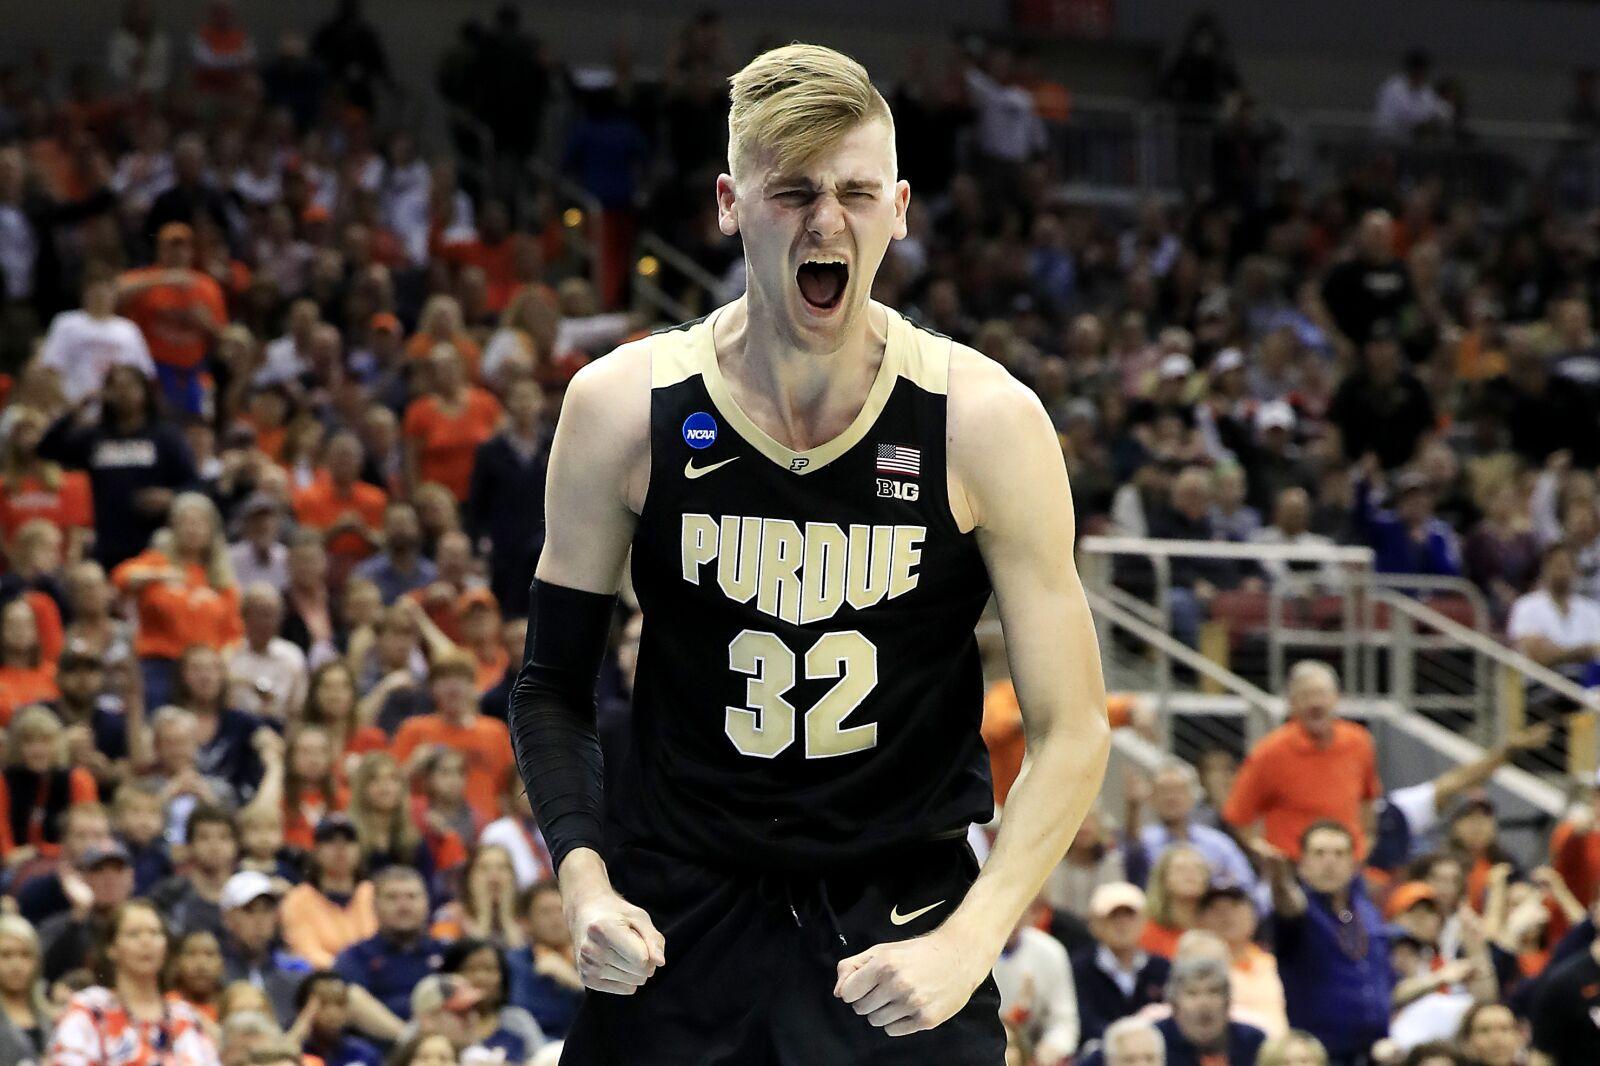 Big Ten Basketball: Way-too-early power rankings for 2019-2020 season